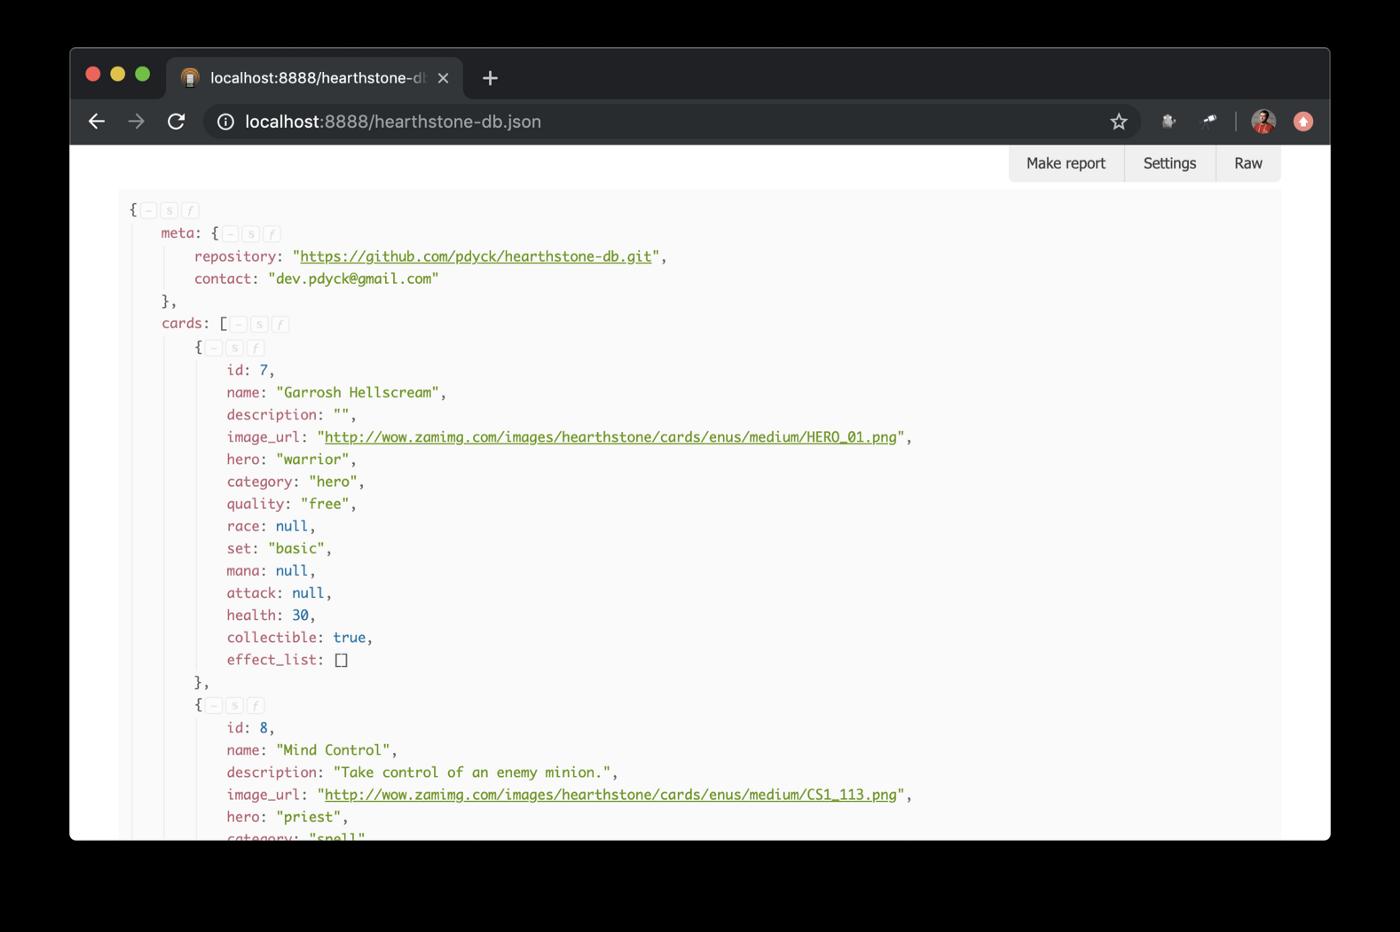 all-cards.json проекта Hearthstone-DB открытый в браузере с установленным JsonDiscovery